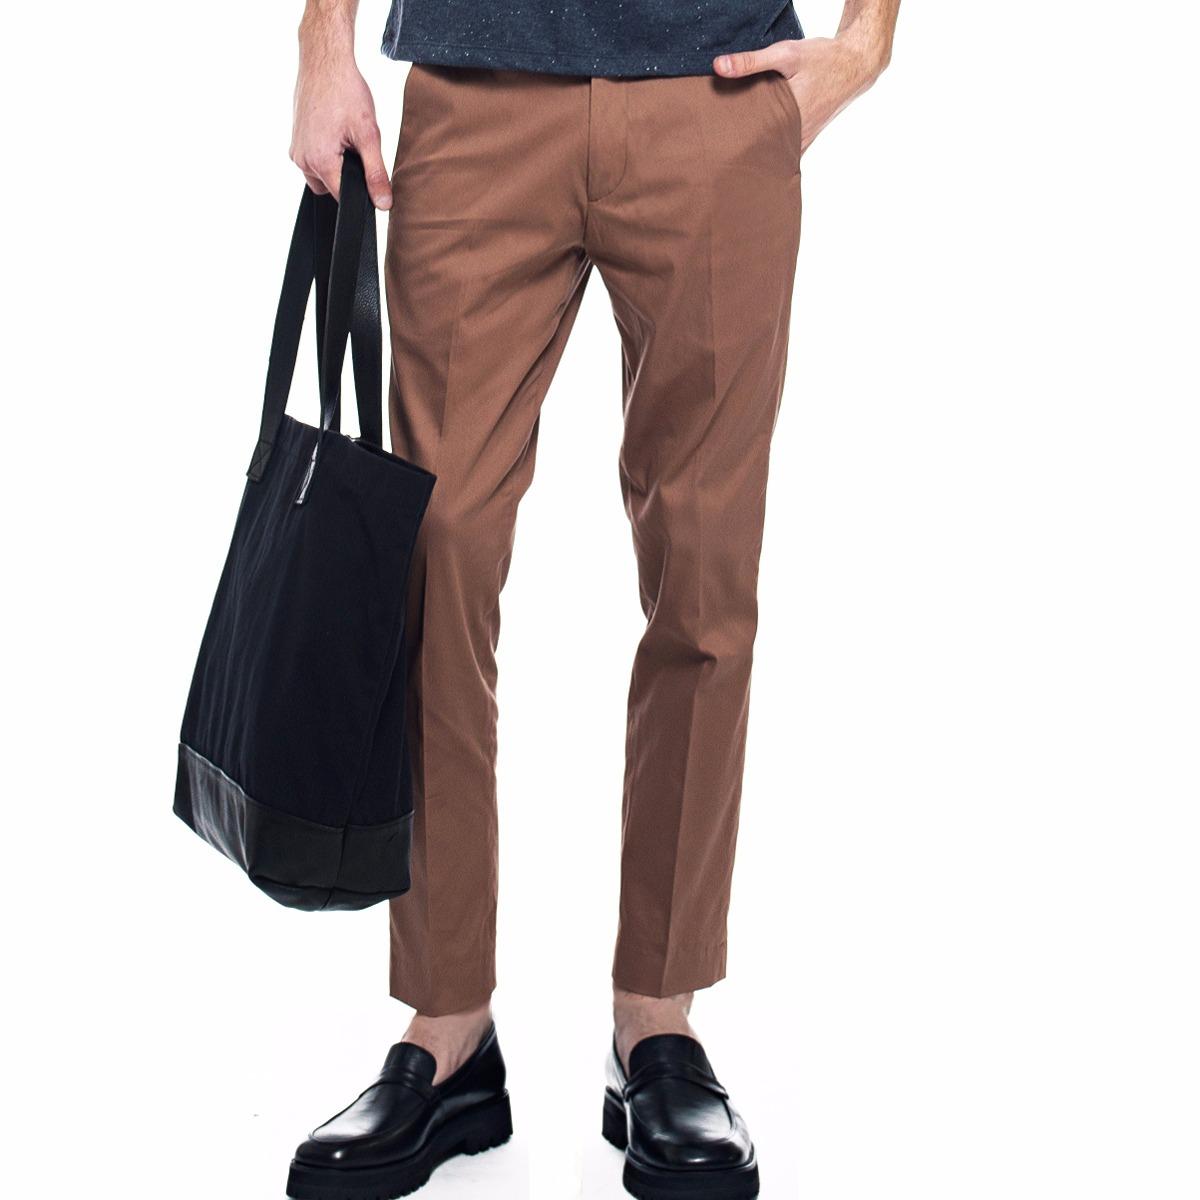 569b90c76 pantalon vestir slim fit gabardina vison   zorzaldelvaga. Cargando zoom.